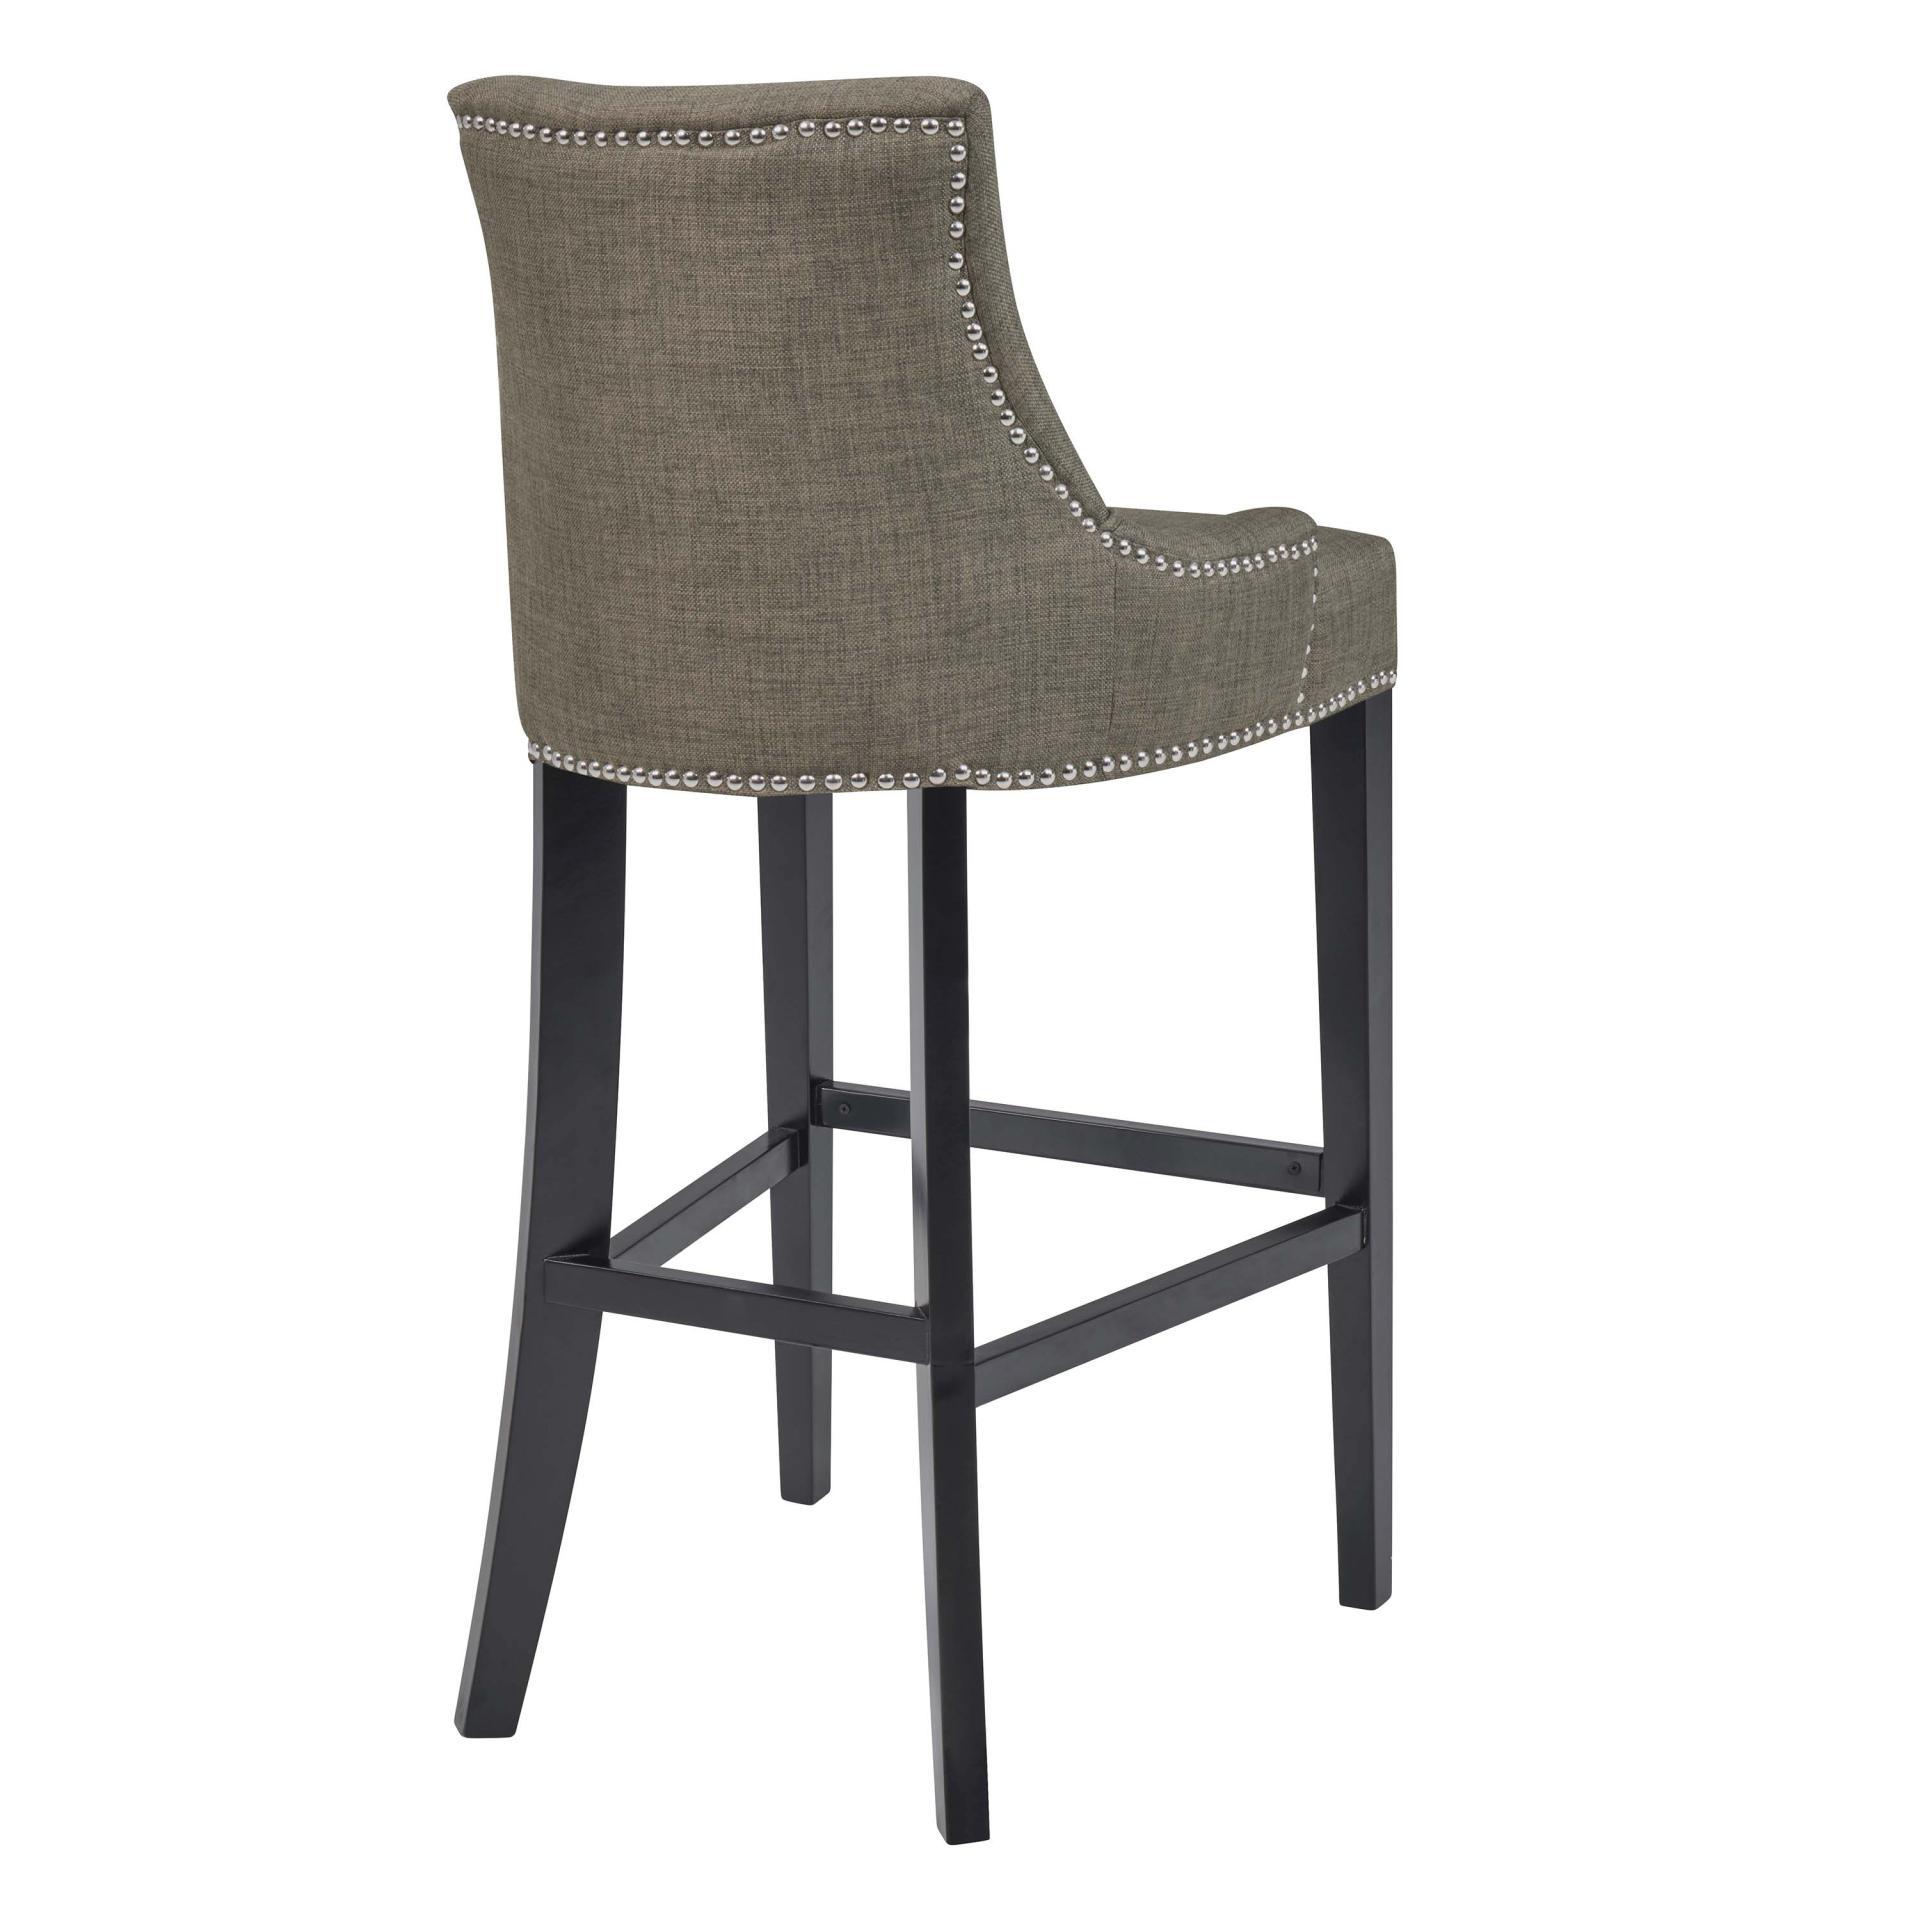 108530 Hs01 Npd Furniture Stylish Amp Affordable